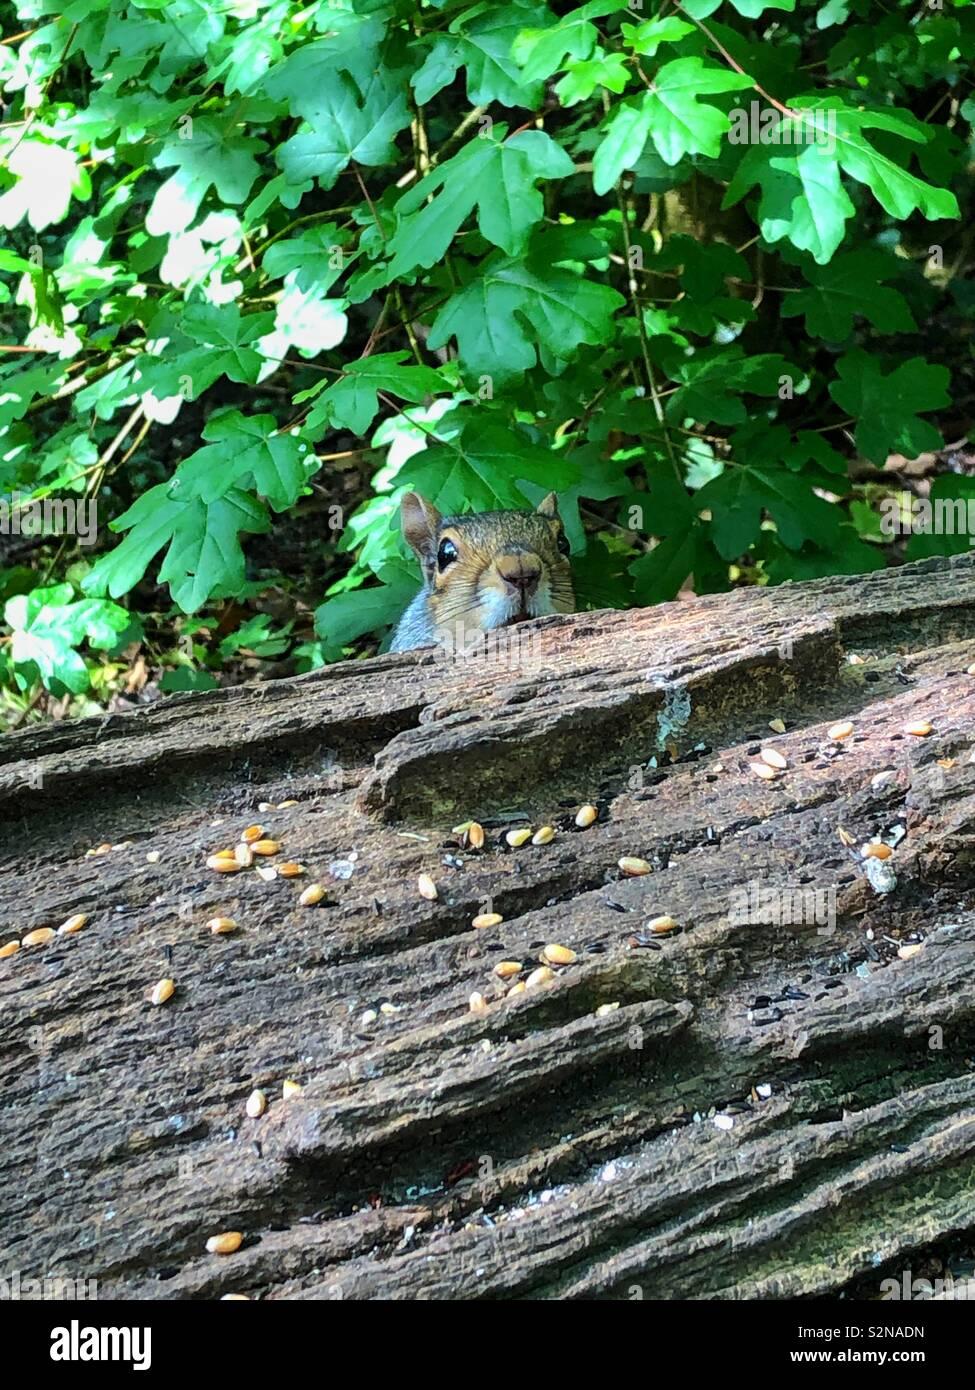 Cheeky grey squirrel peeking from behind an old log, UK, May, South Wales. - Stock Image